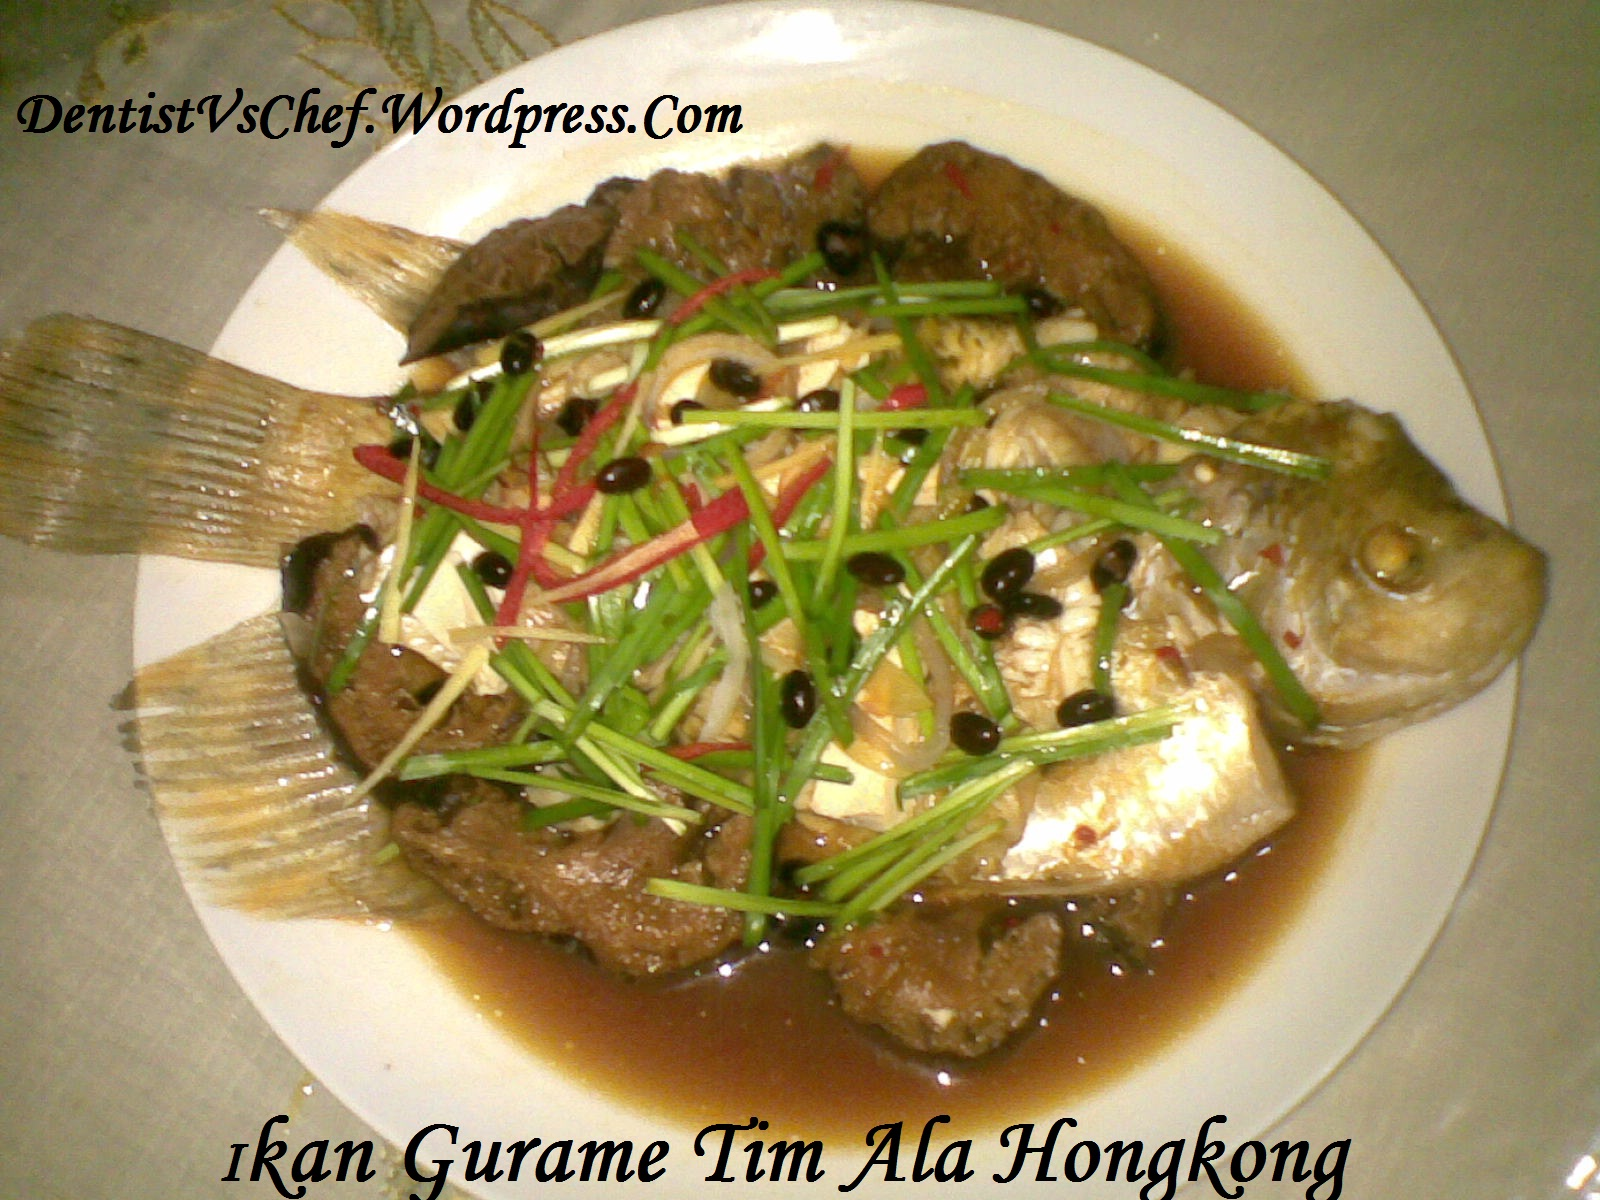 Resep Ikan Gurame Tim/ Steam Hongkong ala Dentist Chef